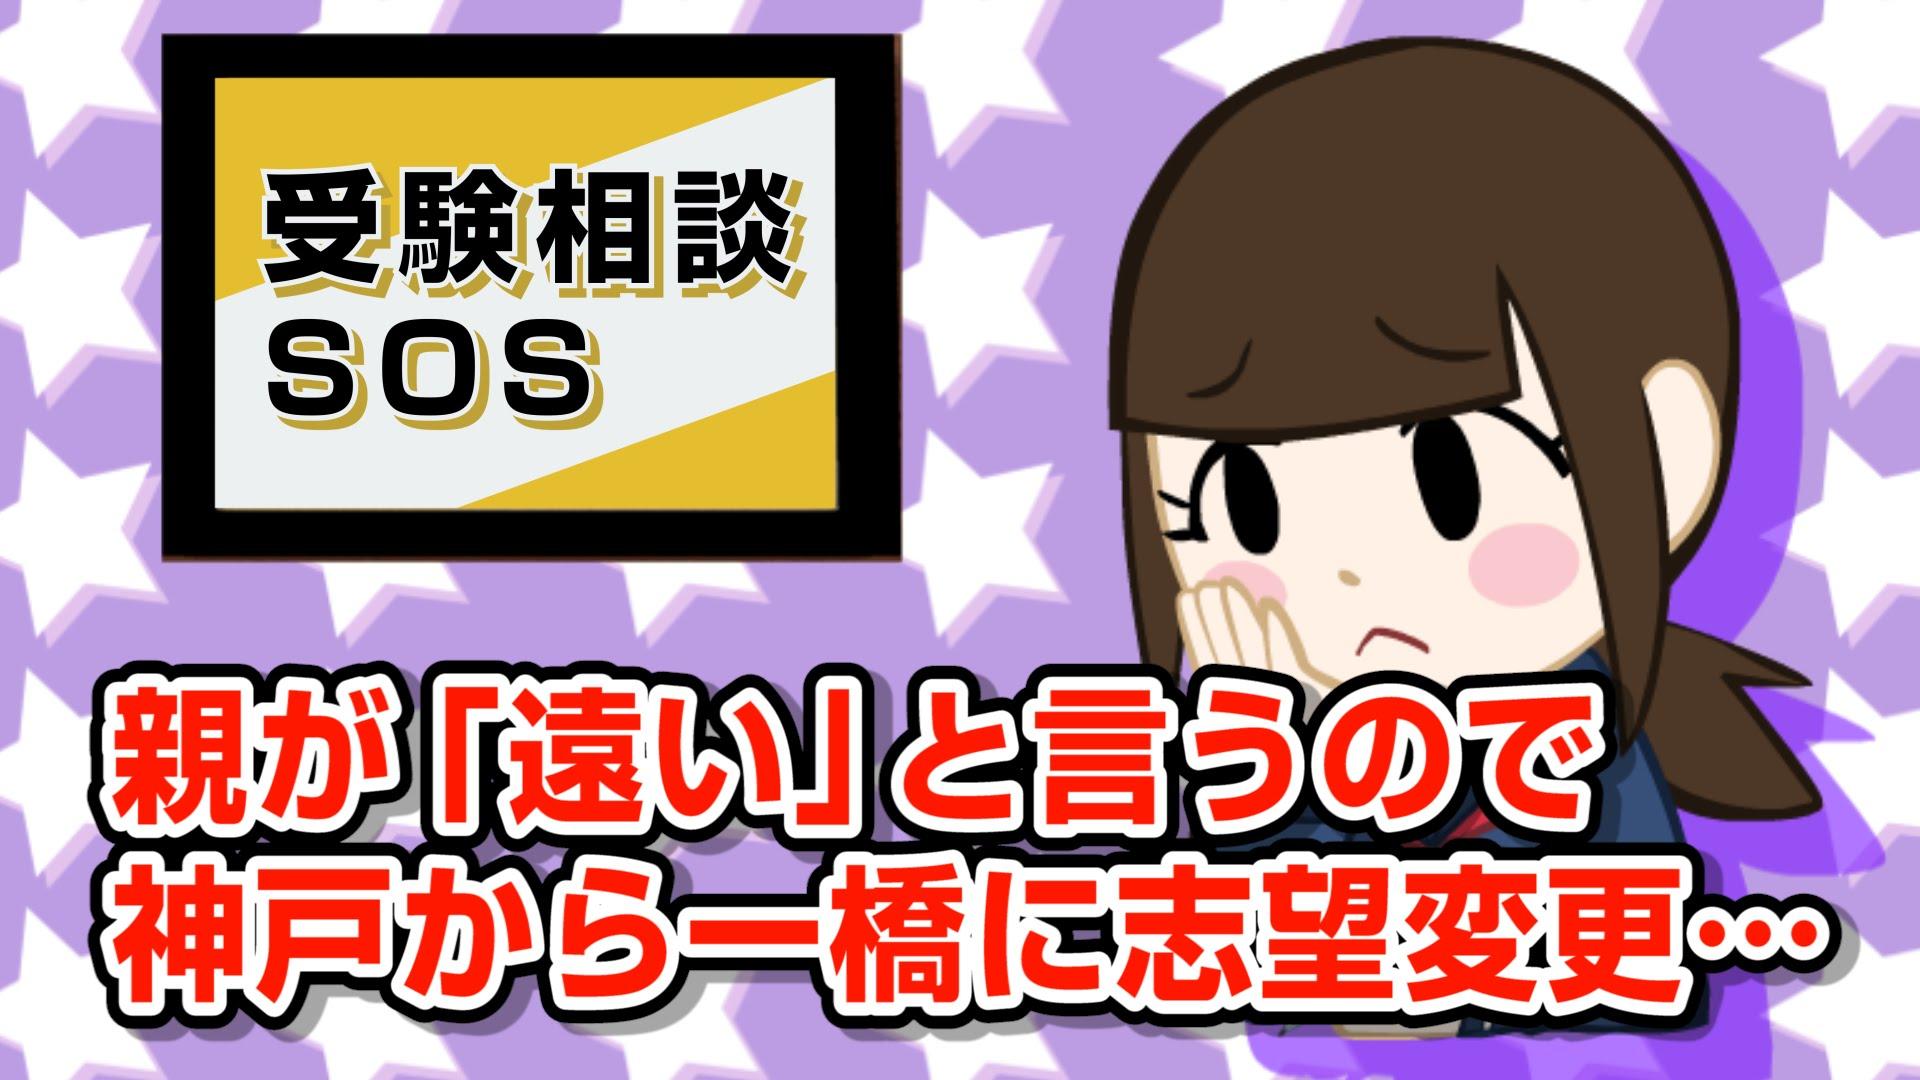 【vol.415】親が「遠い」と言うので神戸大から一橋・経済に志望変更…残り1年で無謀!? 受験相談SOS